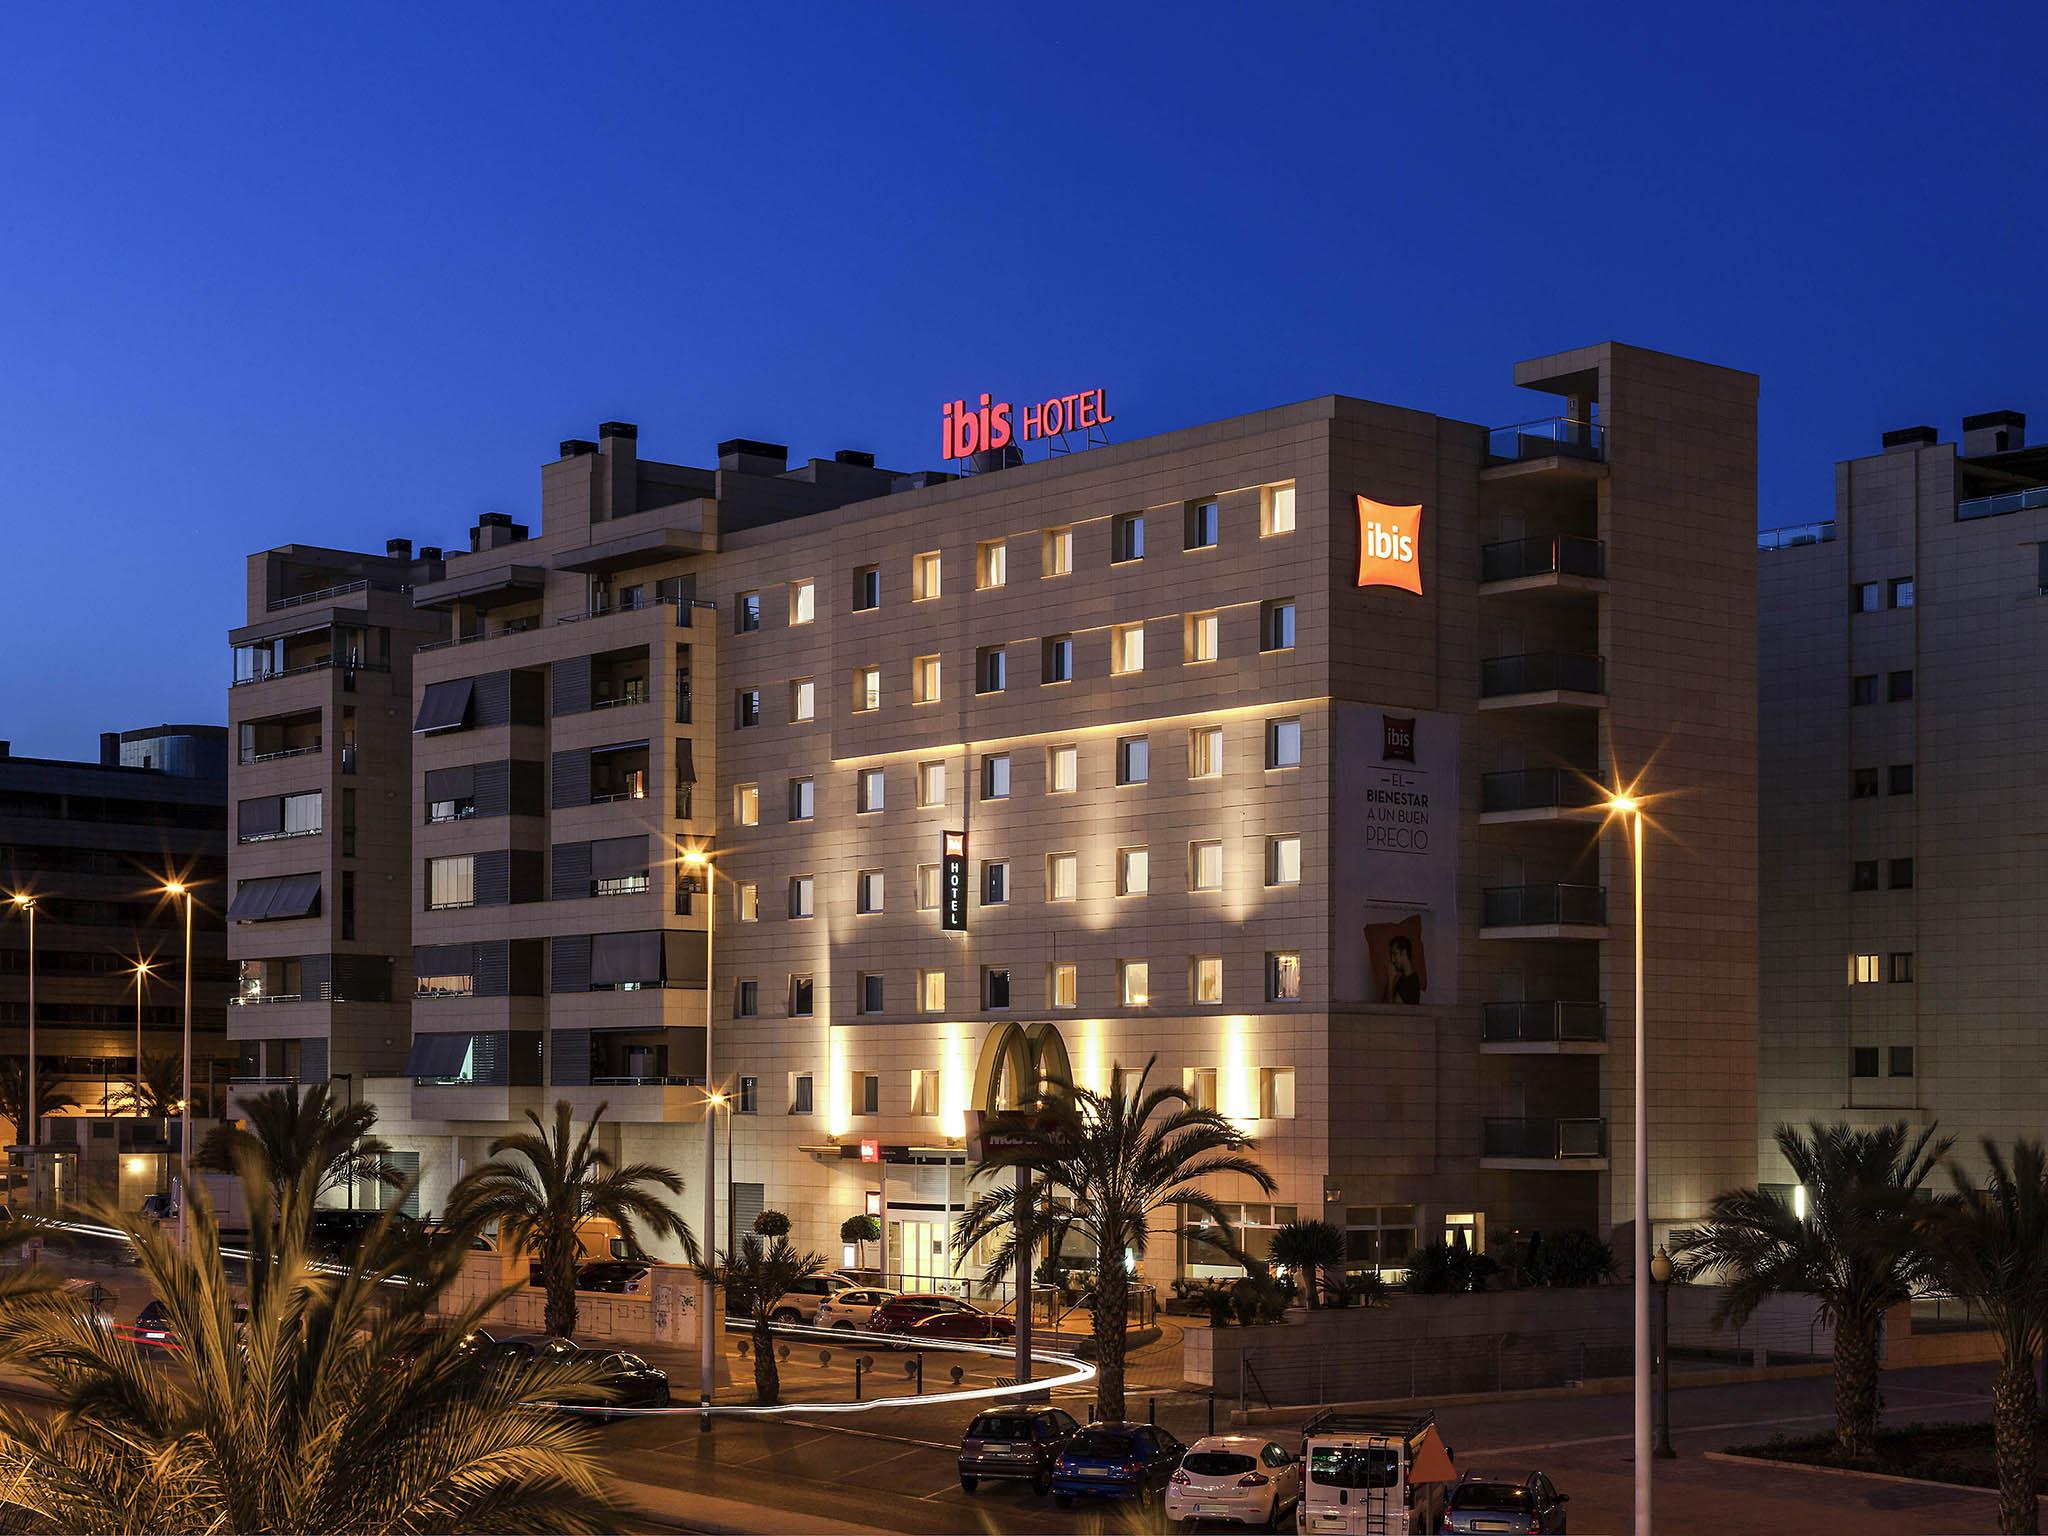 Best Hotel Loyalty Program